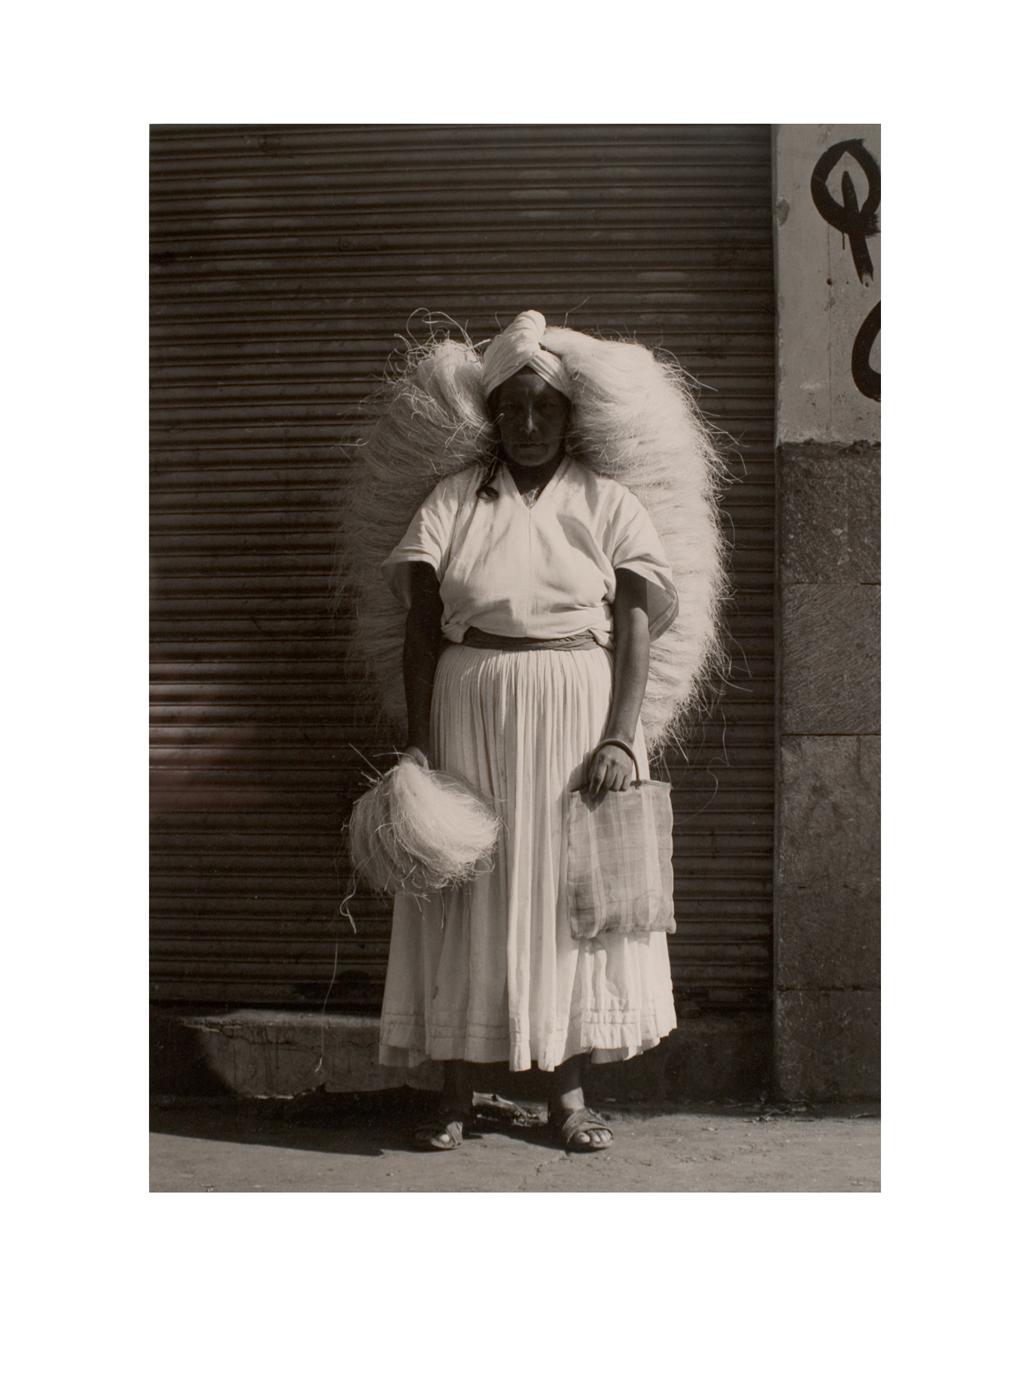 Graciela Iturbide (Mexico, b. 1942)